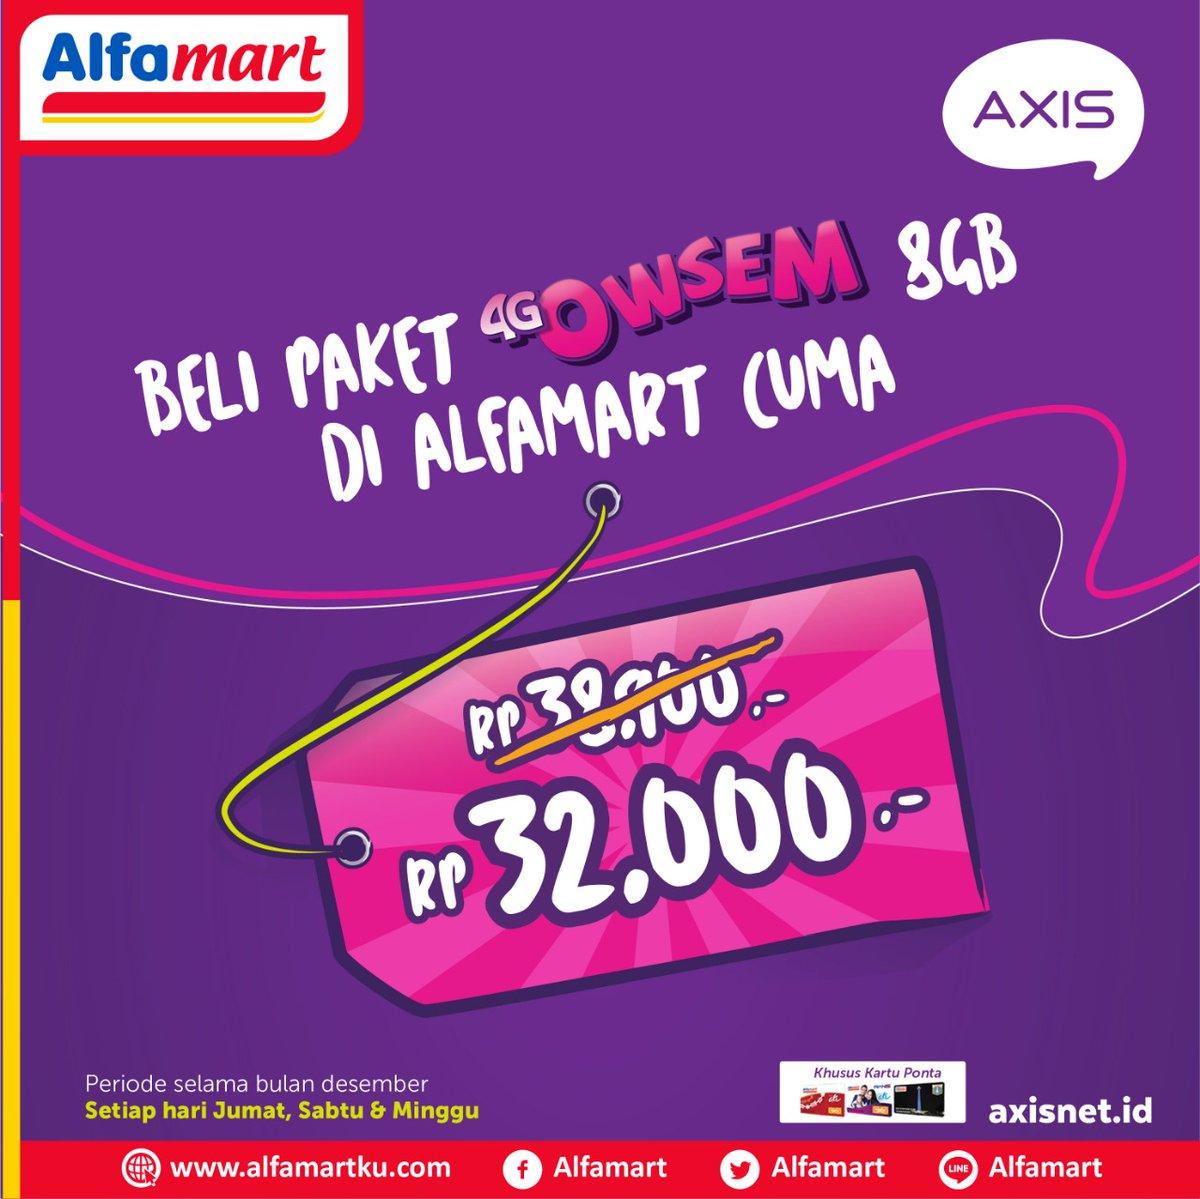 Alfamart - Promo Paket 4G Owsem 8G Cuma 32 Ribu Tiap Weekend (s.d 31 Des 2018)